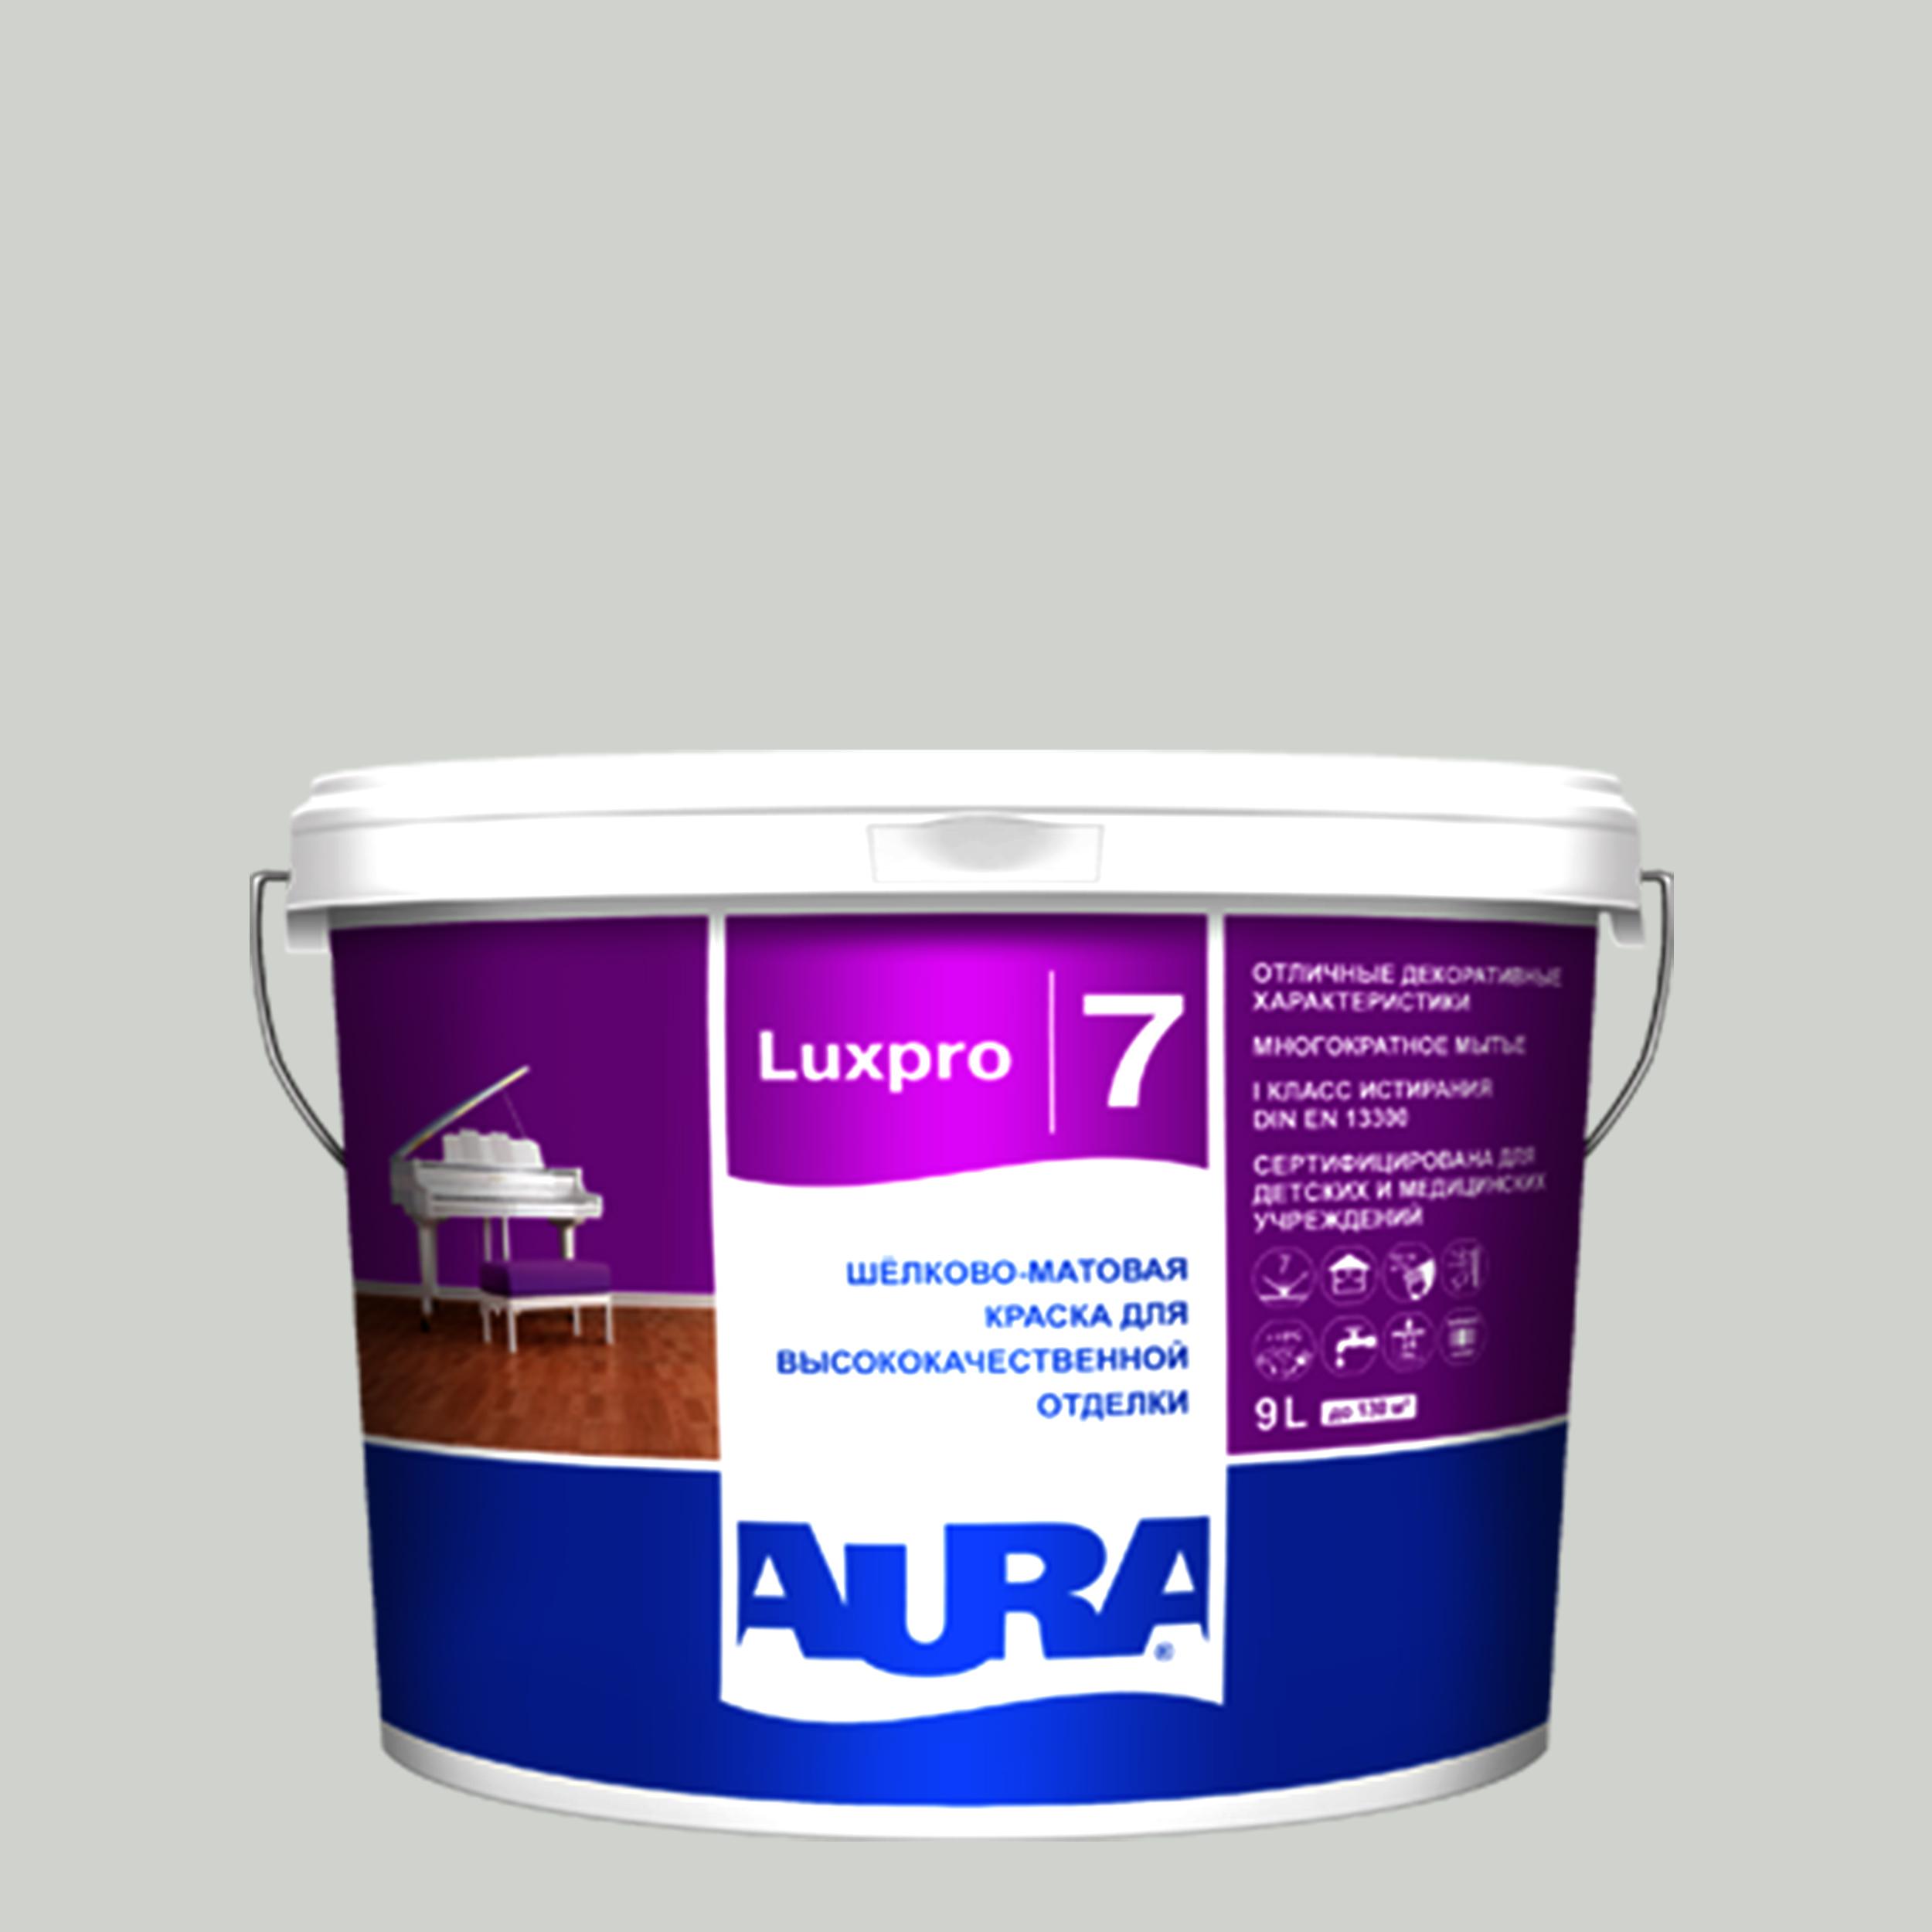 Фото 4 - Краска интерьерная, Aura LuxPRO 7, RAL 1023, 11 кг.